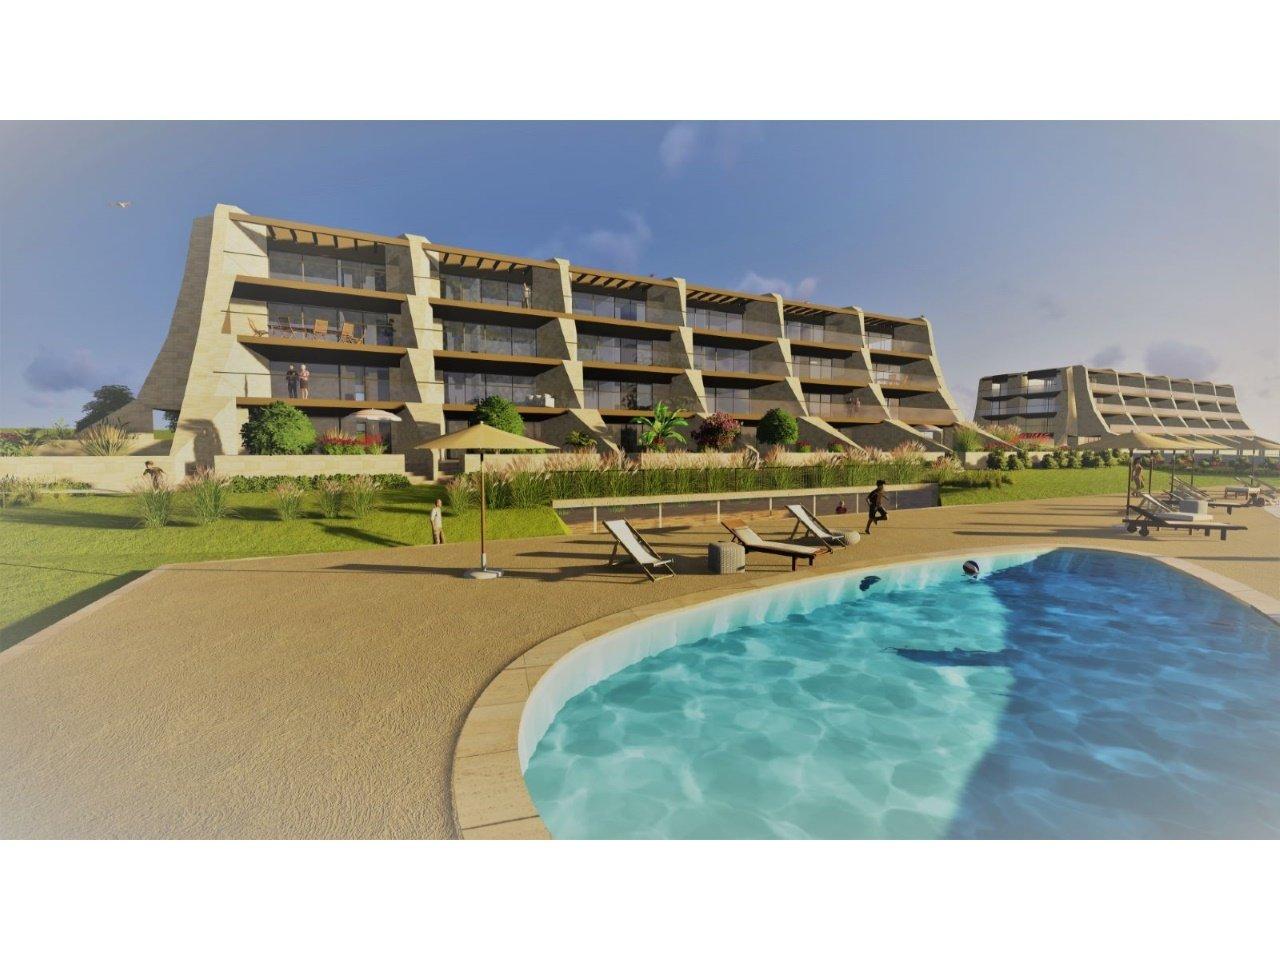 2 Bedroom Apartment Vilamoura, Central Algarve Ref: AAA47